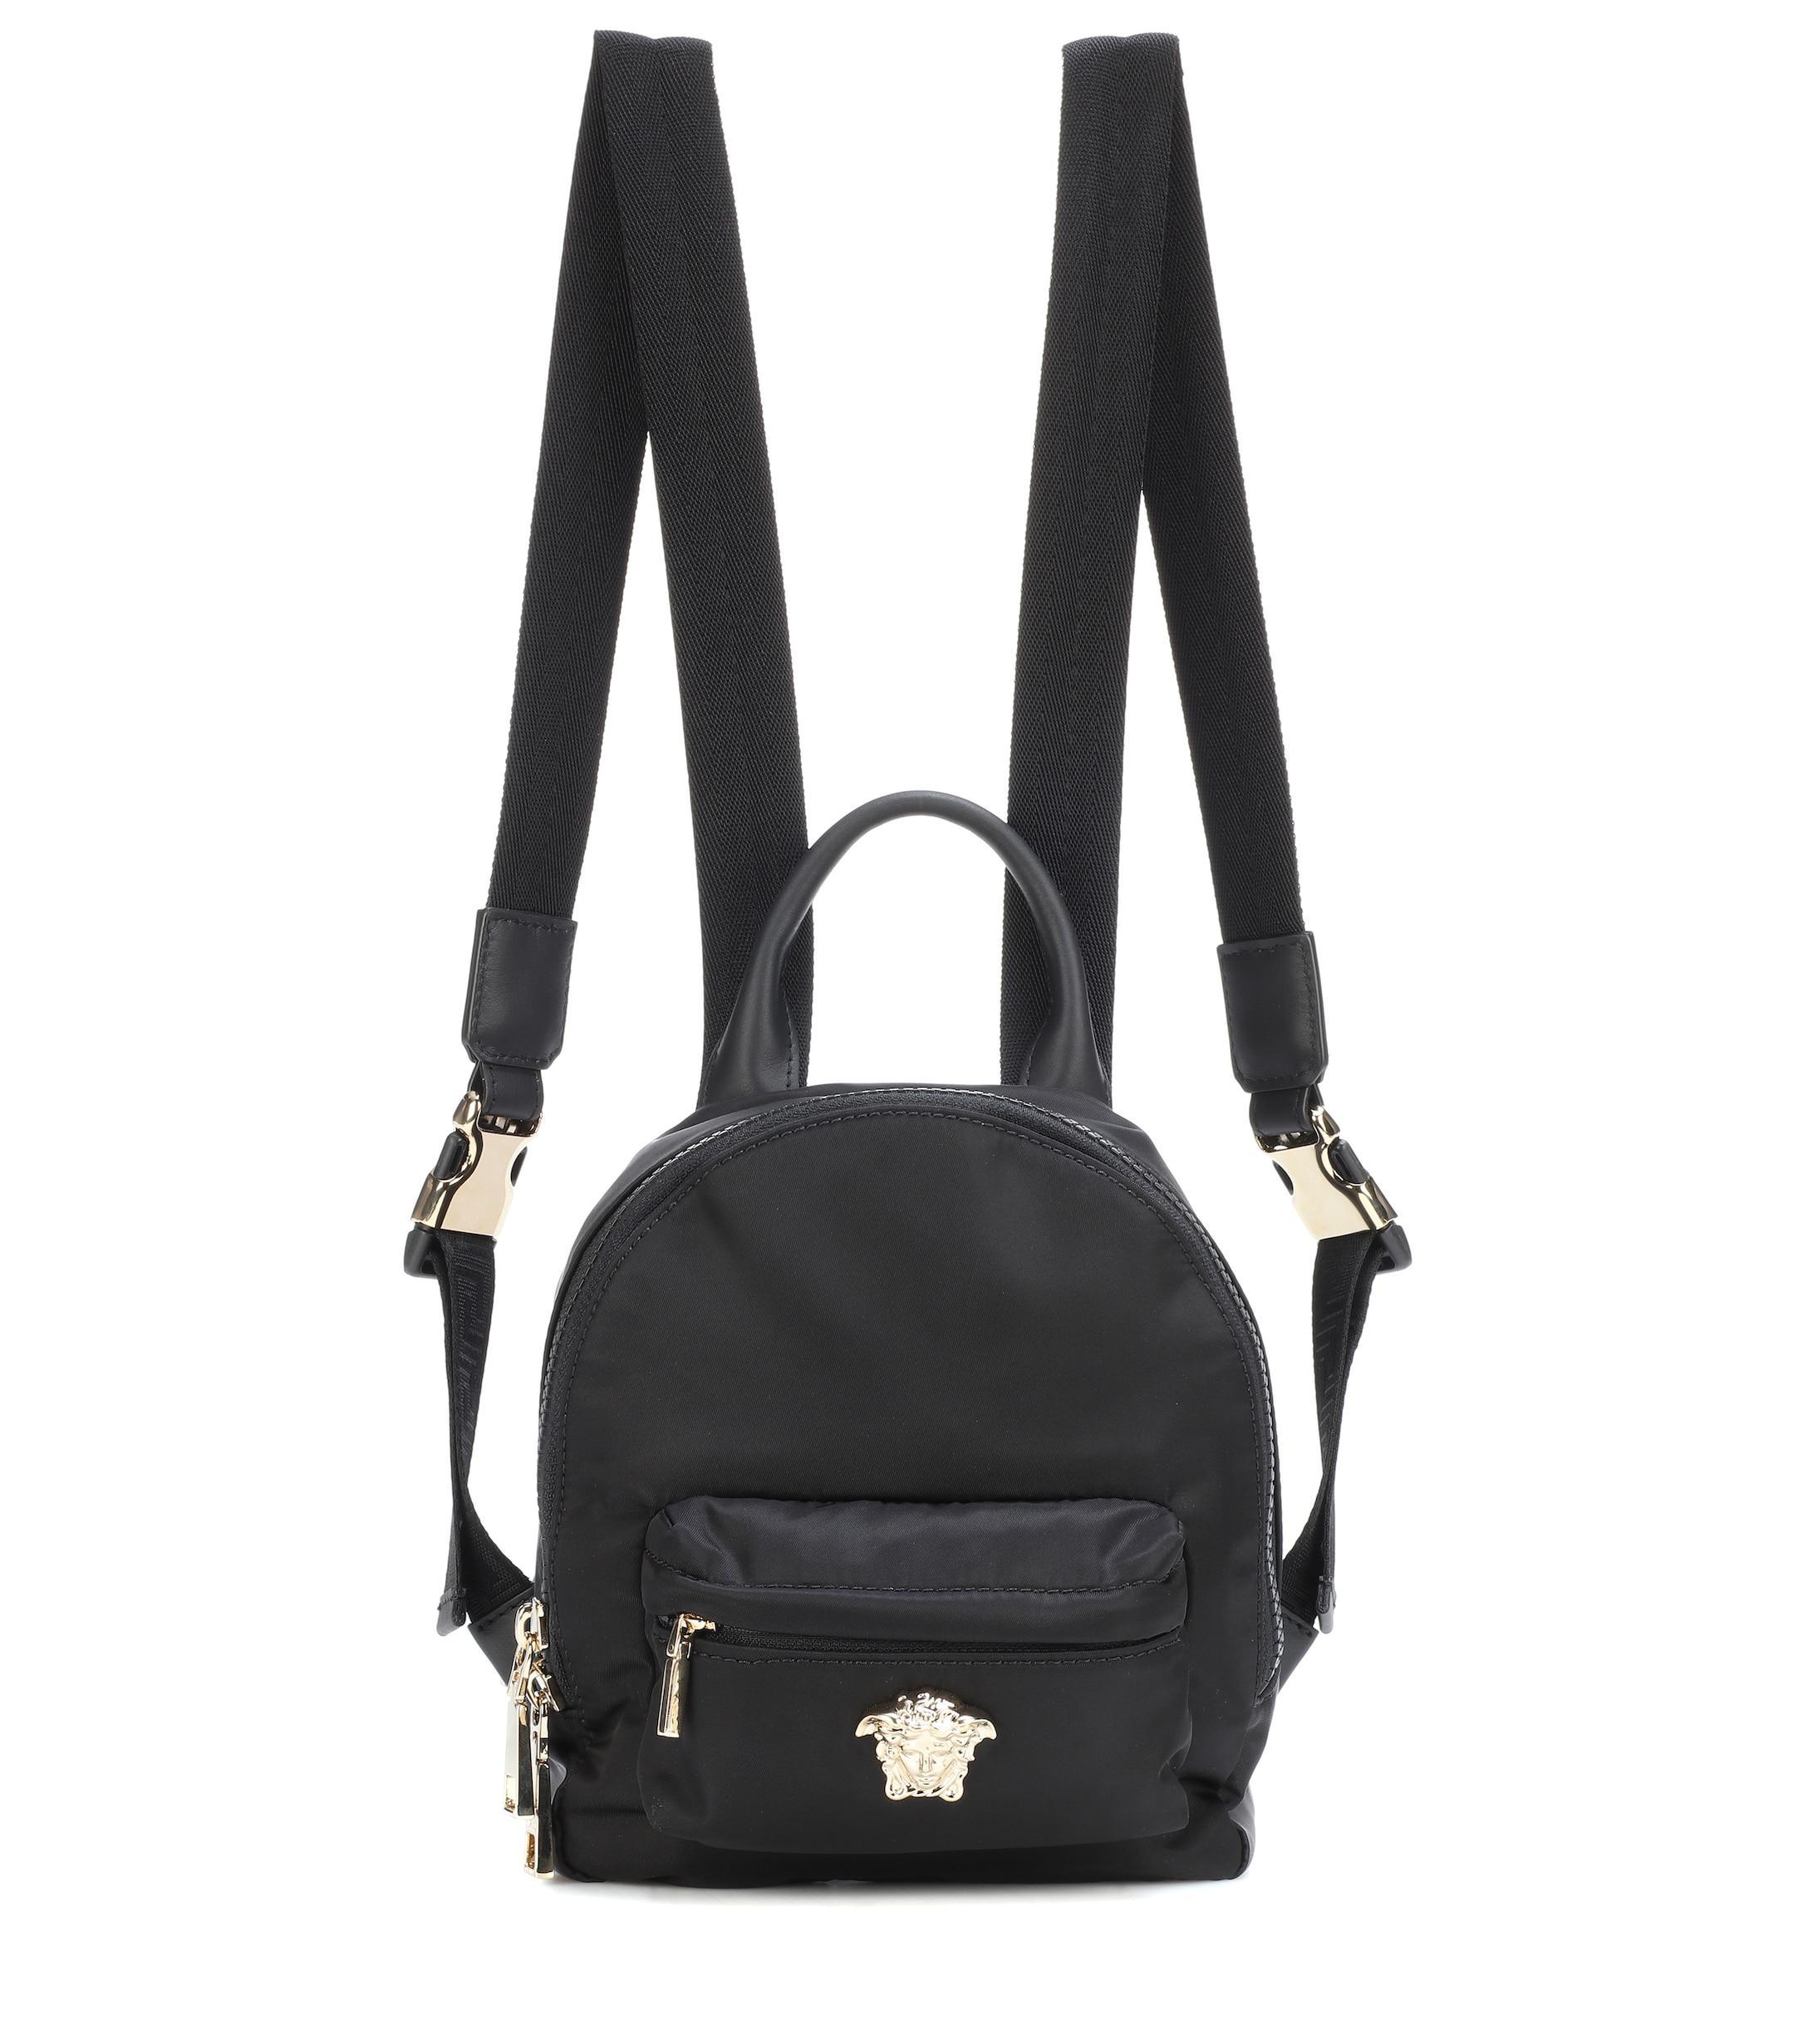 Versace Palazzo Mini Nylon Backpack in Black - Lyst 01f8c47912